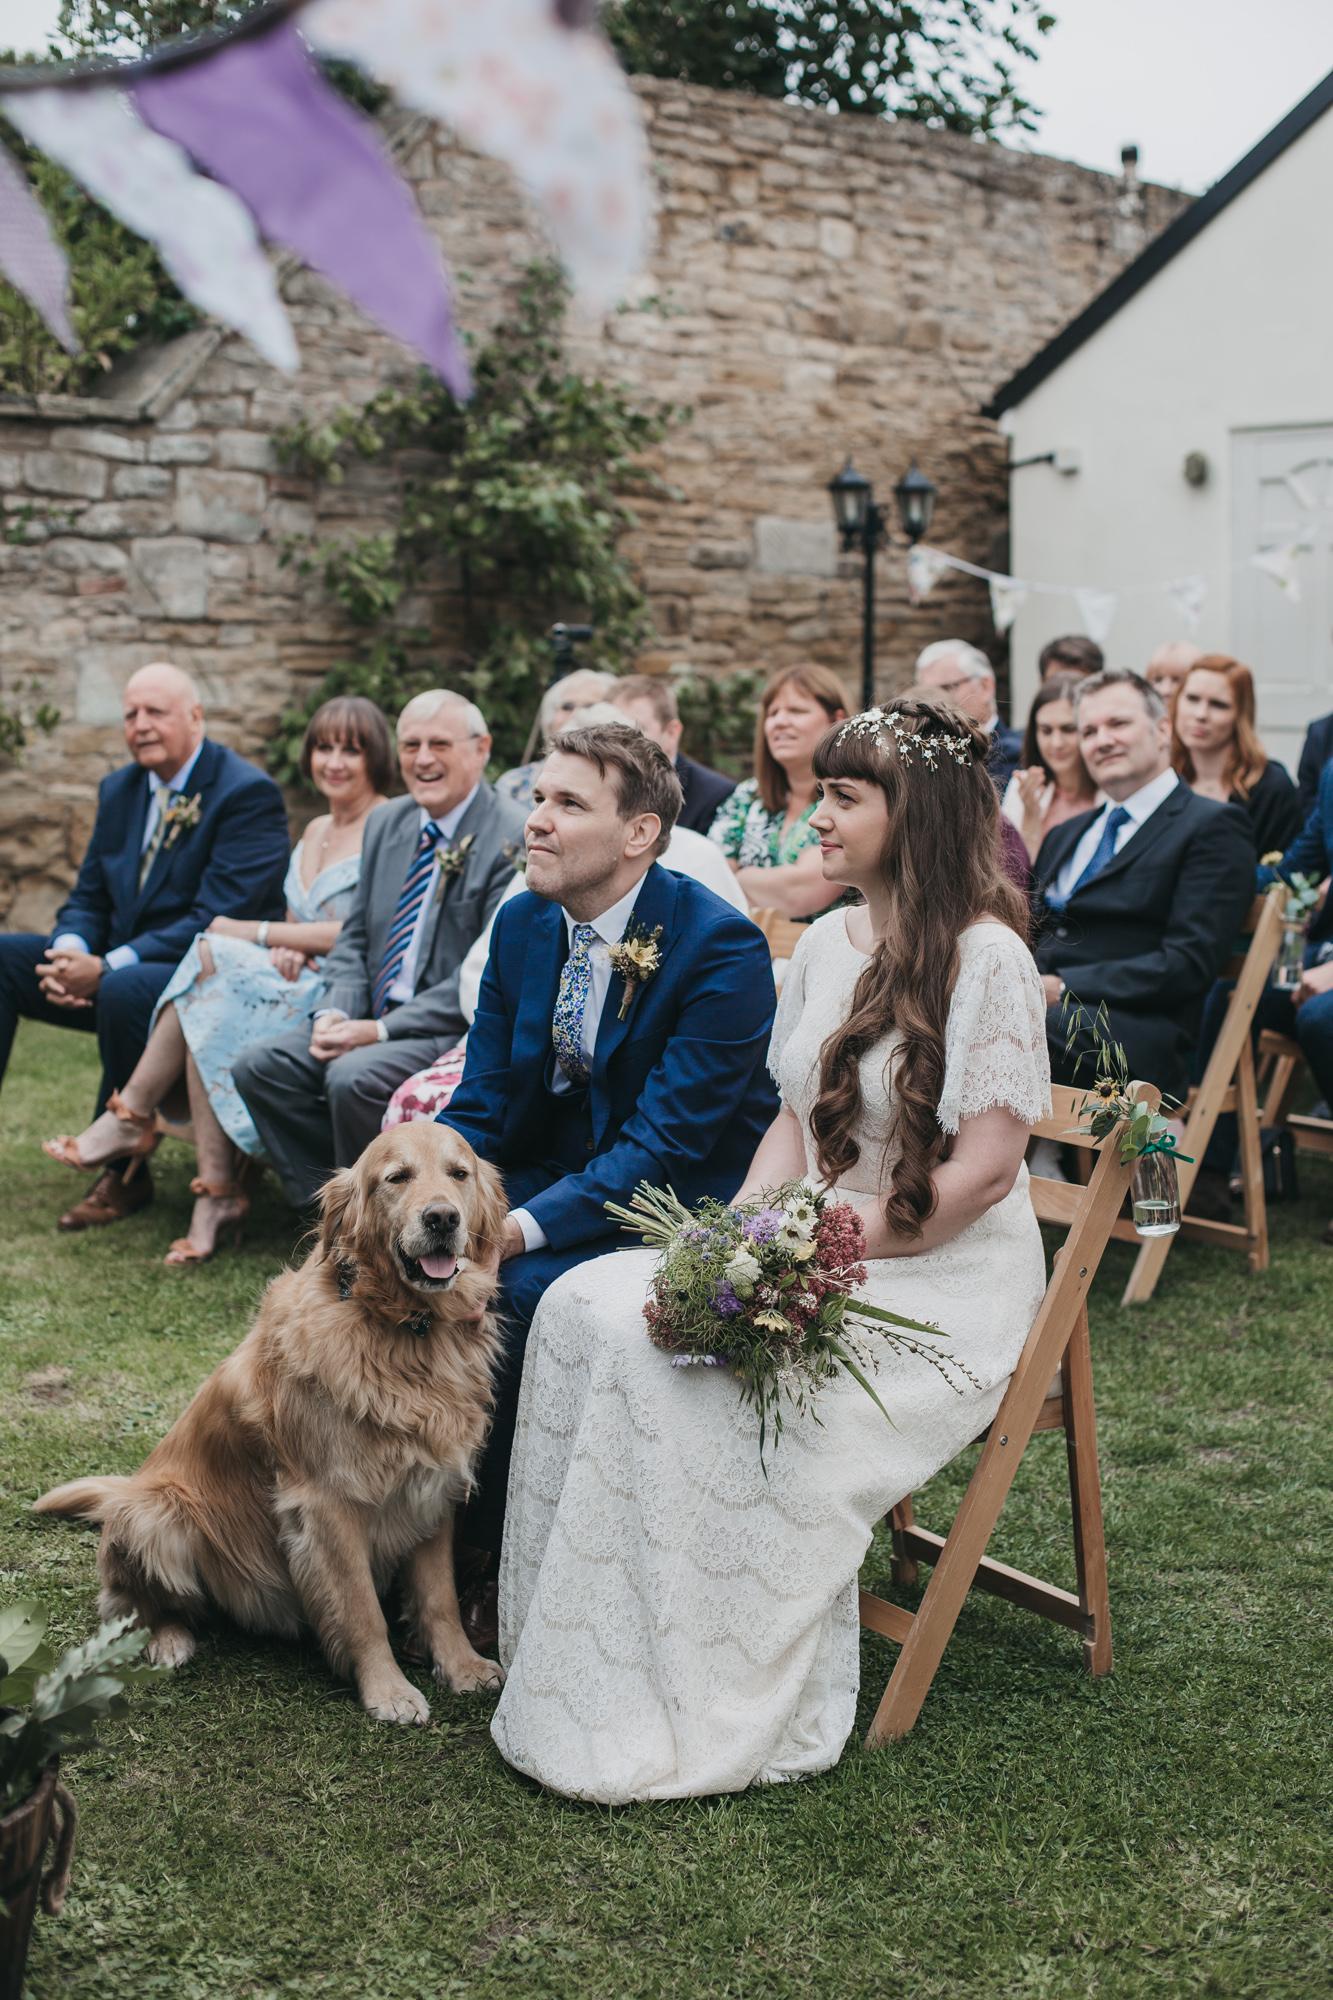 Kristy-Back-Garden-Outdoor-Wedding-Sheffield-Industrial-Warehouse-Wedding-Bohemian-Kate-Beaumont-Dahlia-Dress-16.jpg